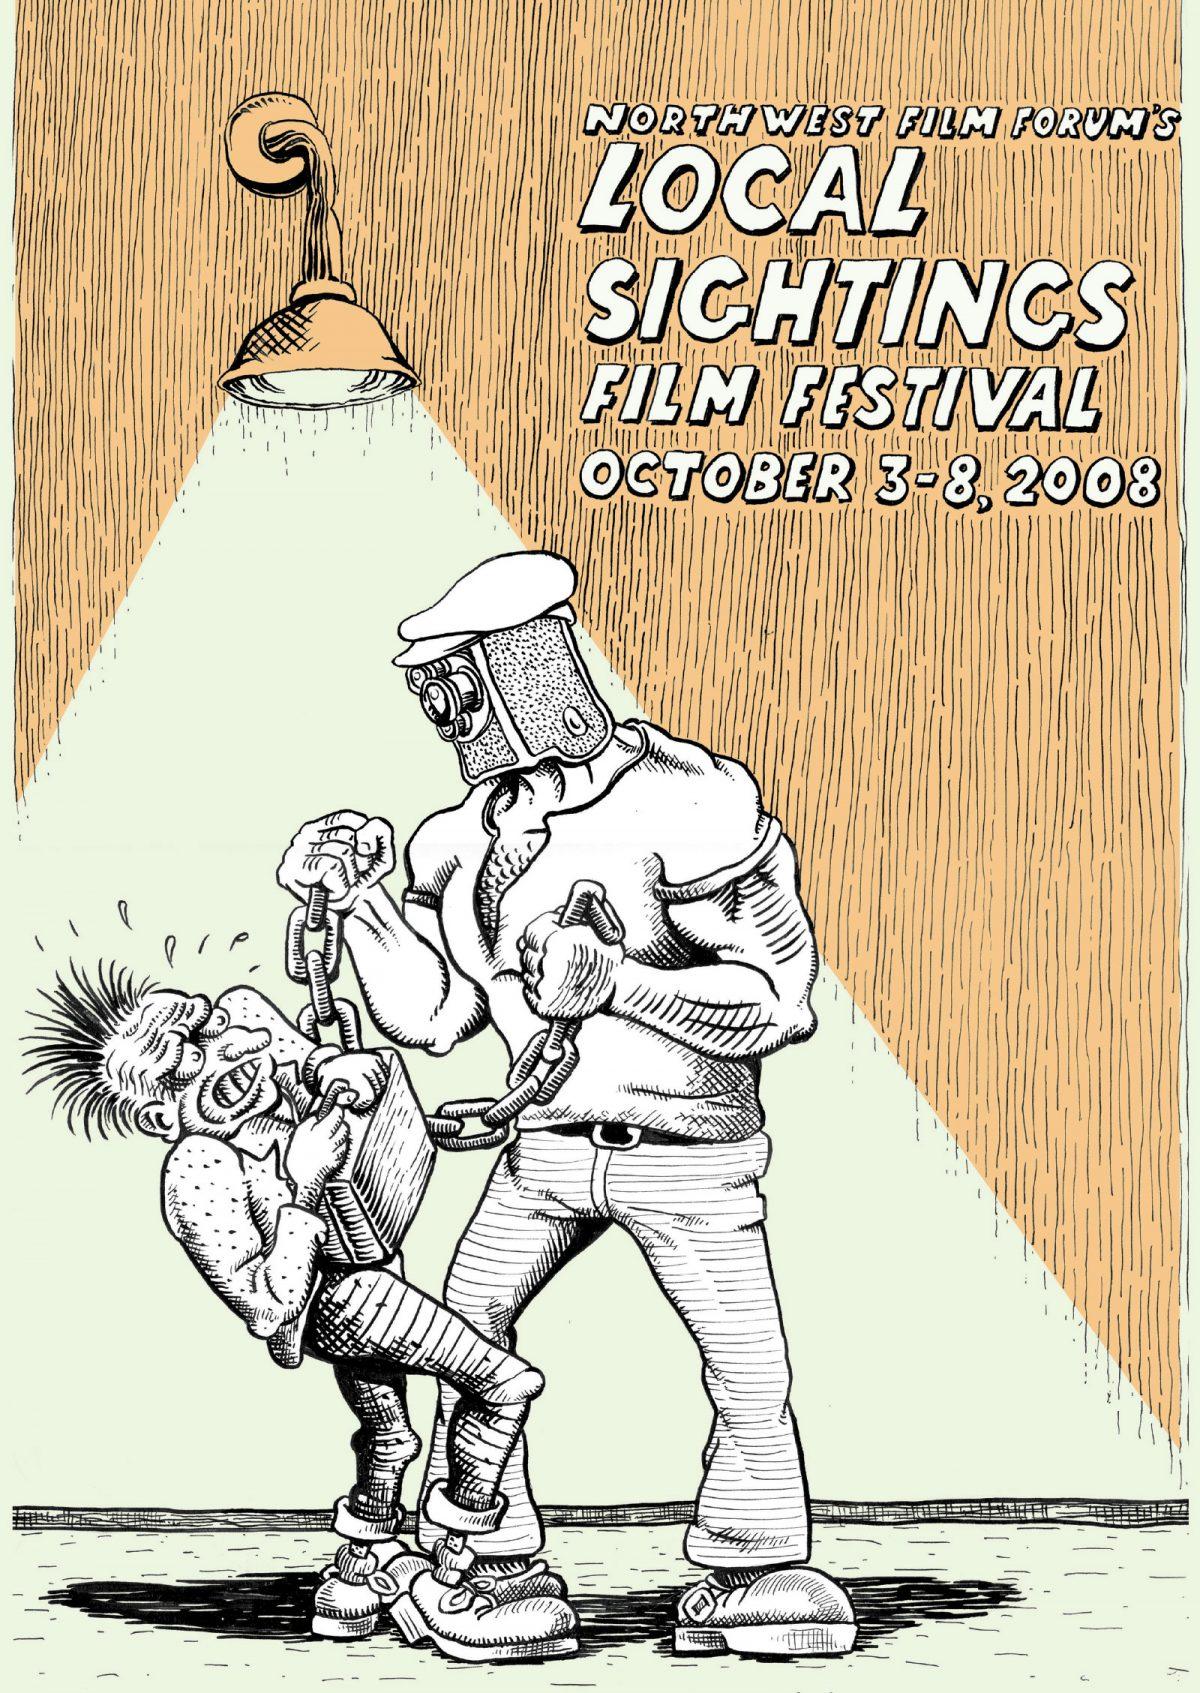 Local Sightings Film Festival 2008